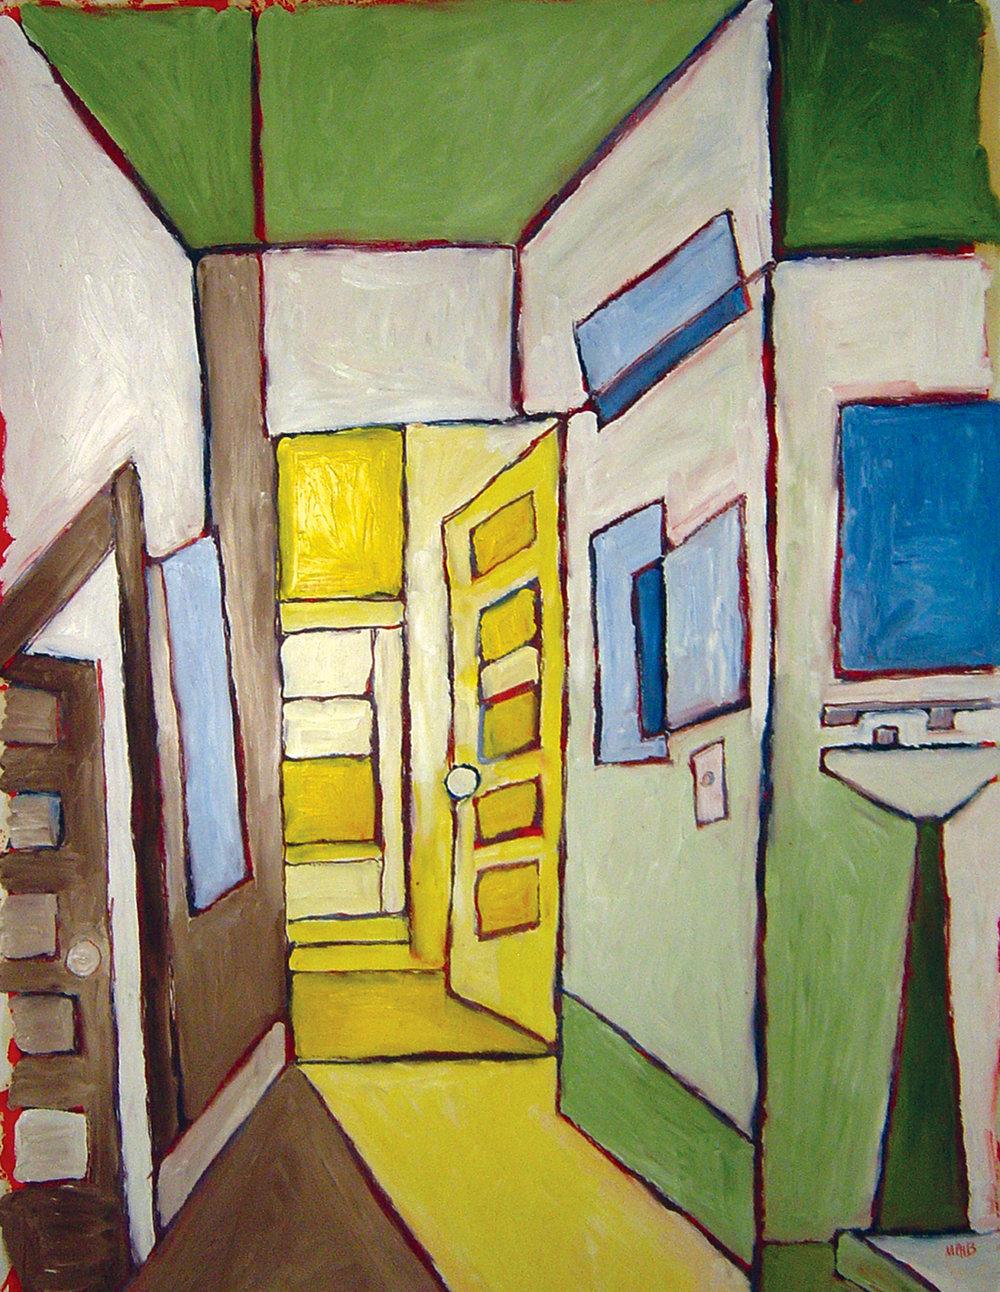 Hallway on Farwell<br> <br>oil on paper